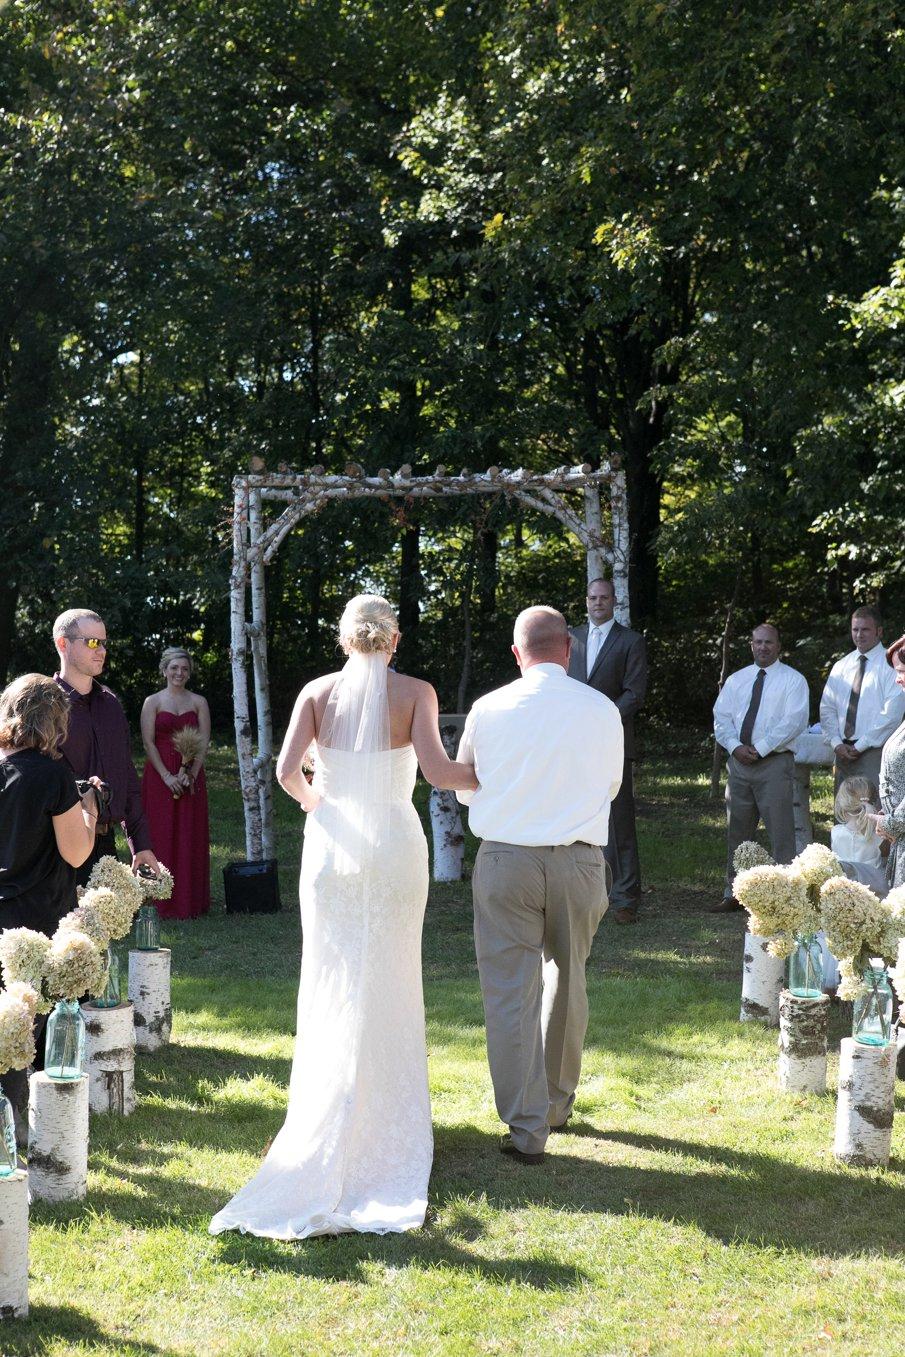 Alice Hq Photography | Scott + Jen | Southern MN Wedding6.jpg